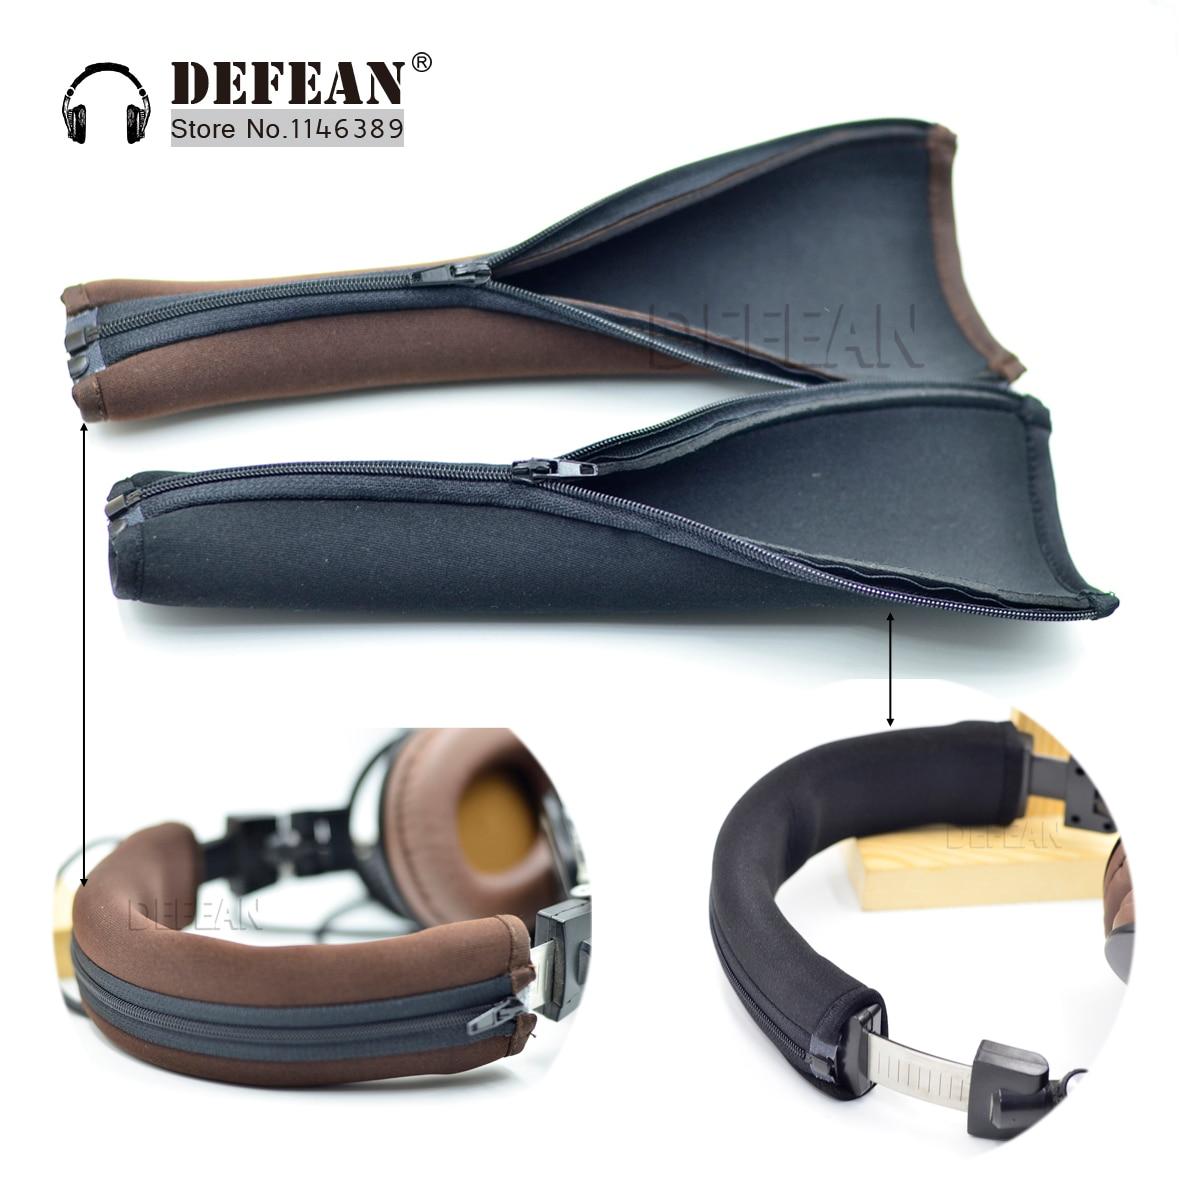 Headband Hook Repair Part Replace For Audio Technica ATH MSR7 msr 7 headphones